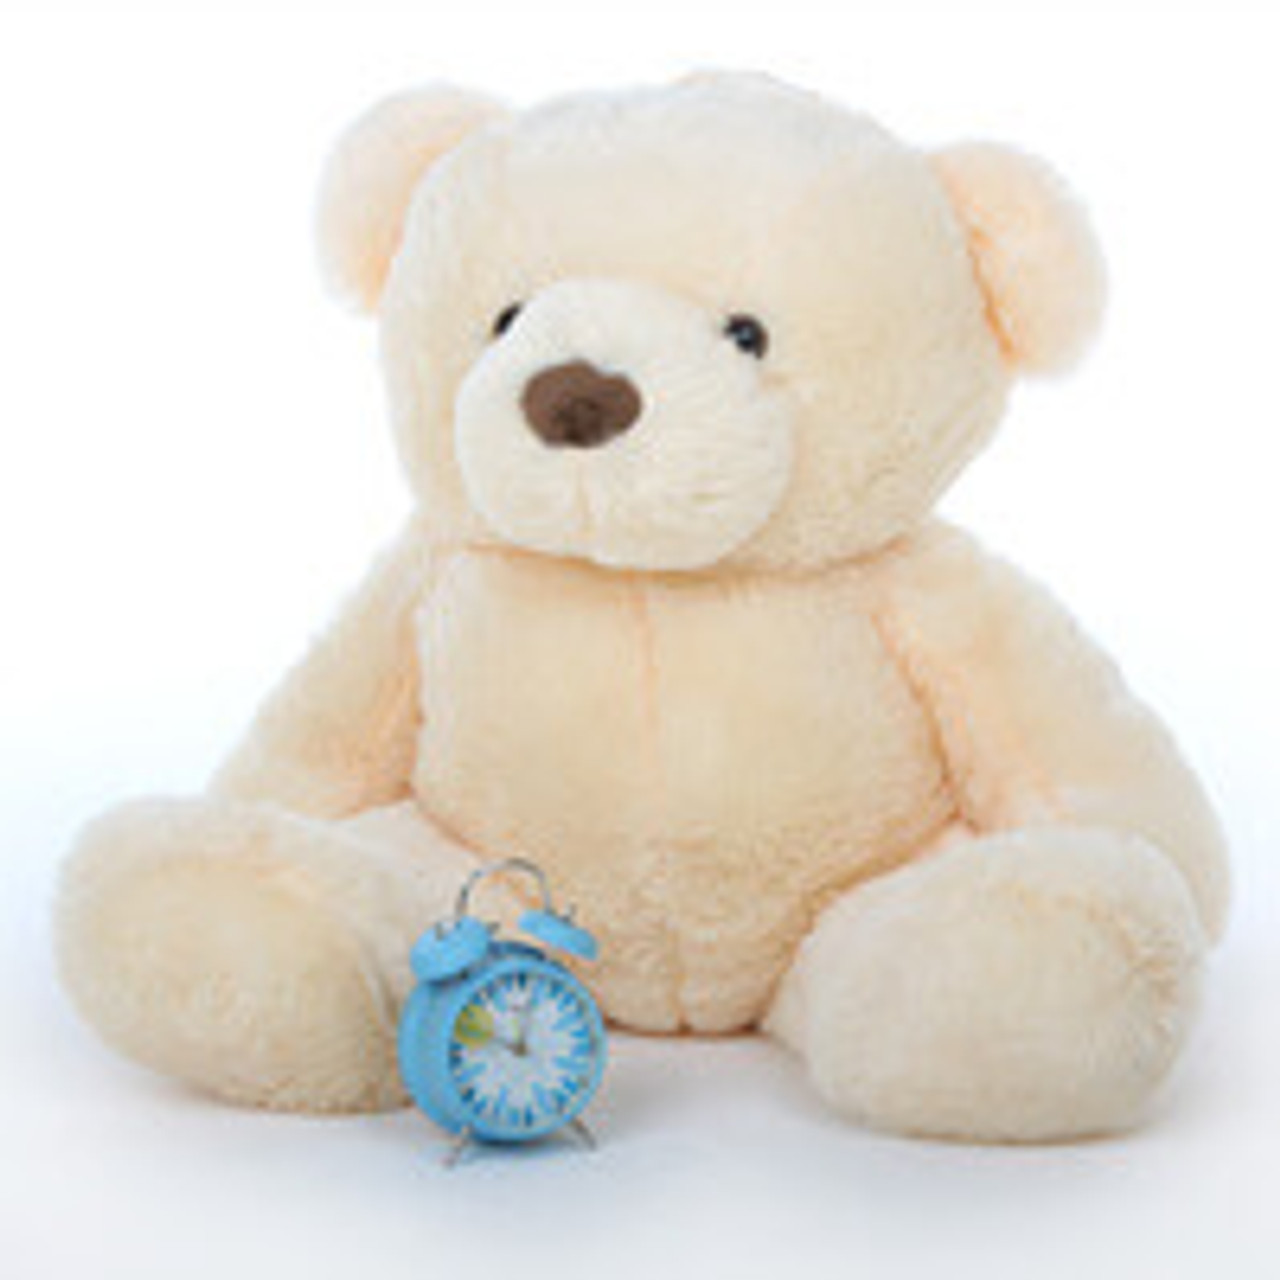 Smiley Chubs vanilla cream teddy bear 38in